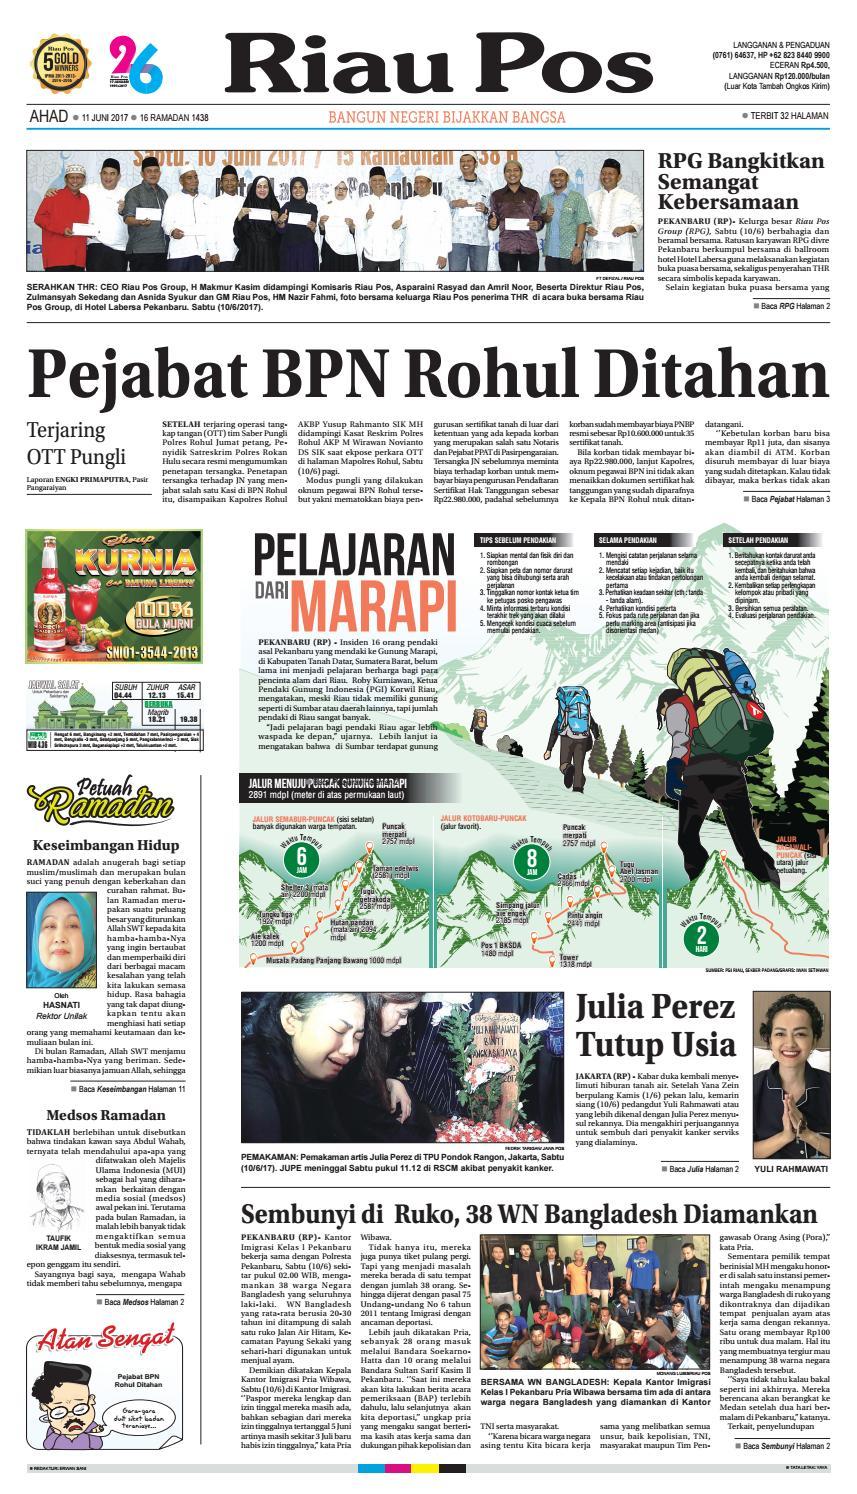 2017 06 11 By Riau Pos Issuu Ic 555 Motorcycle Alarm Circuit Koleksi Skema Rangkaian Artikel